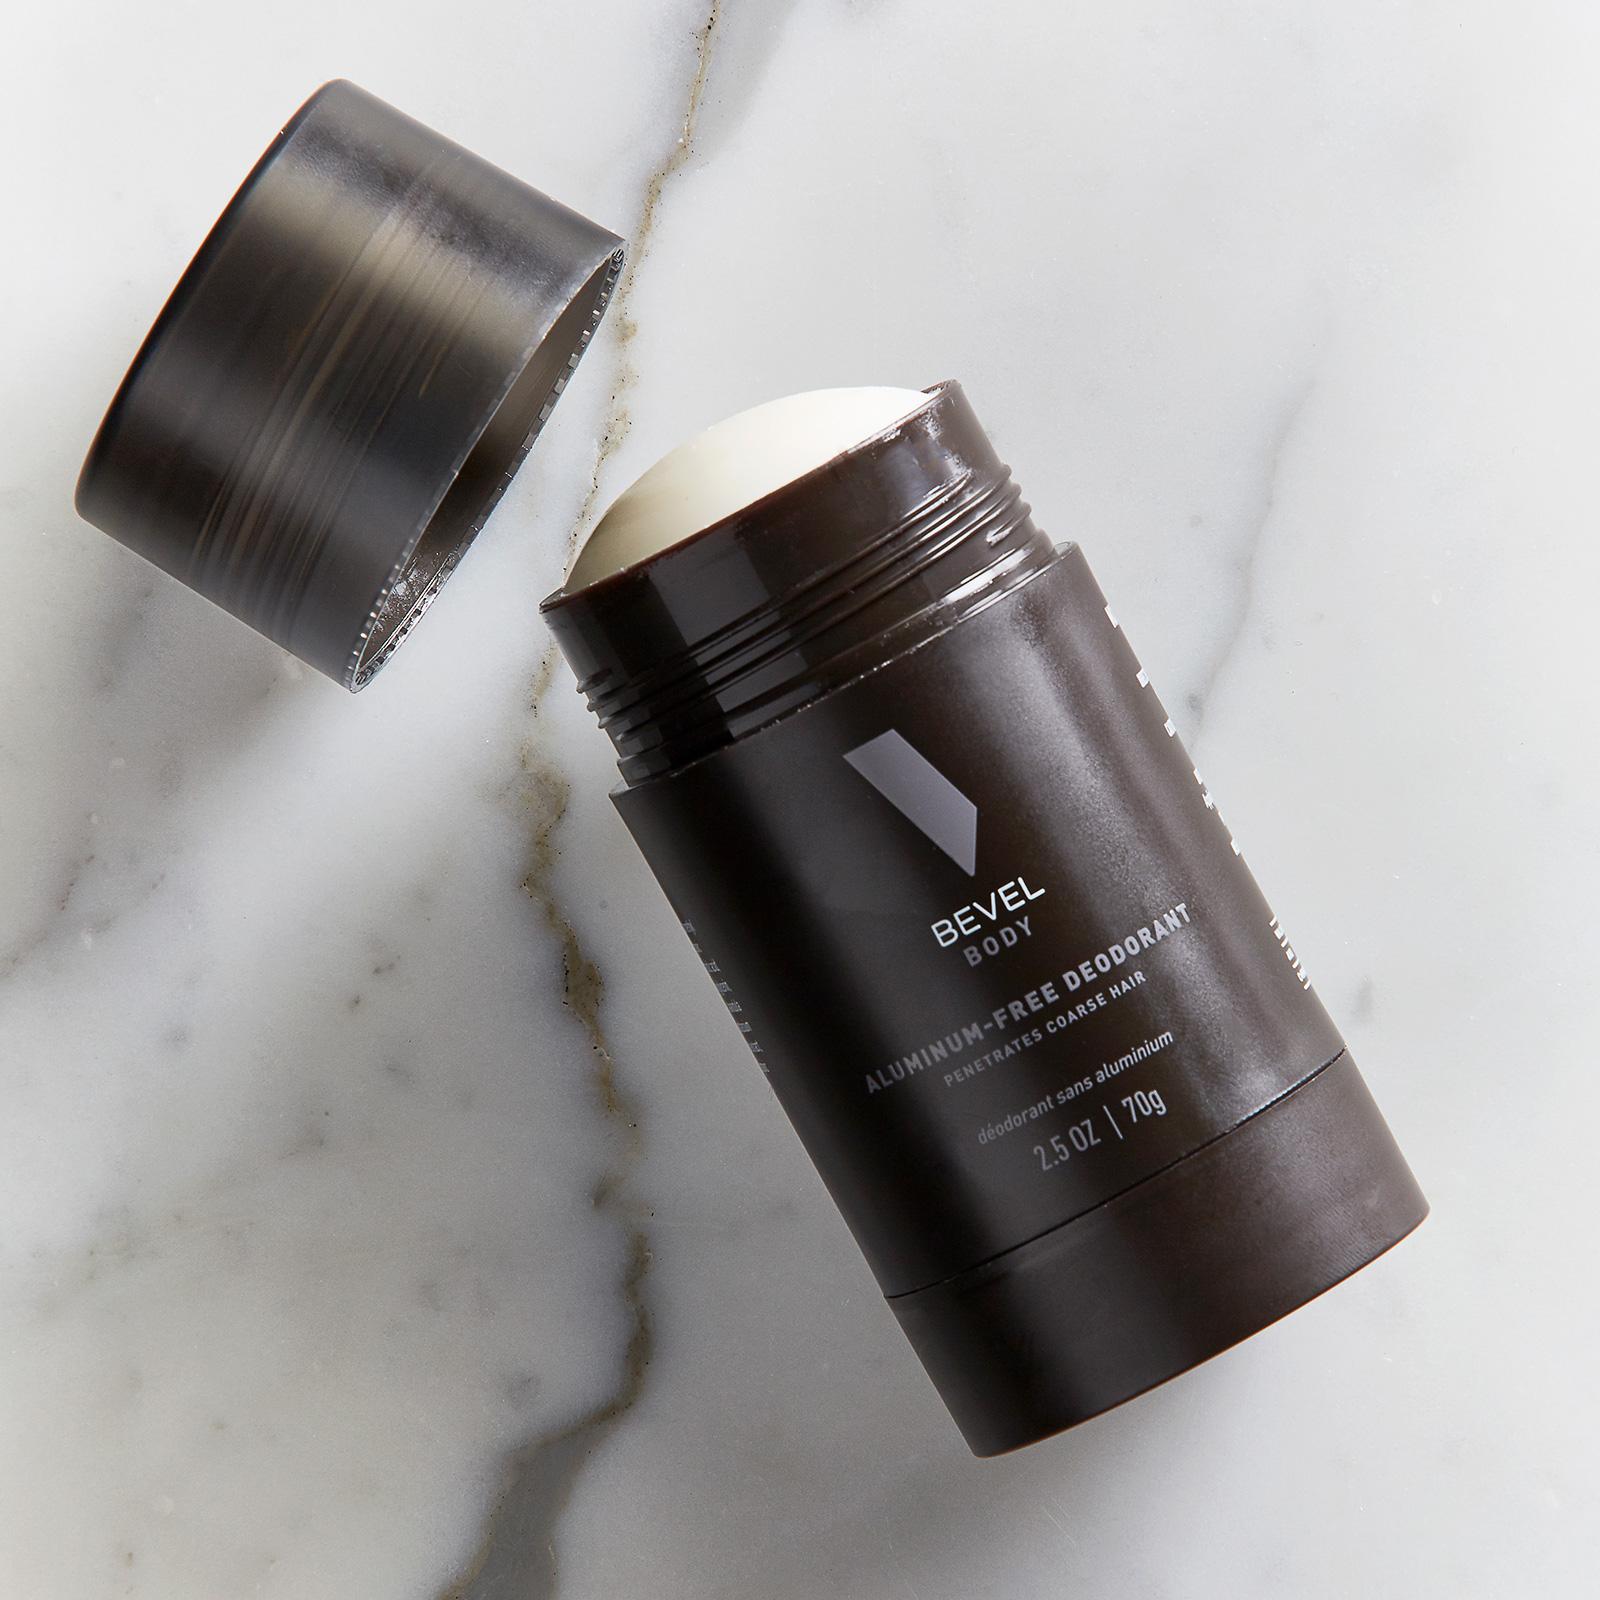 bevel body care deodorant 48 hour protection